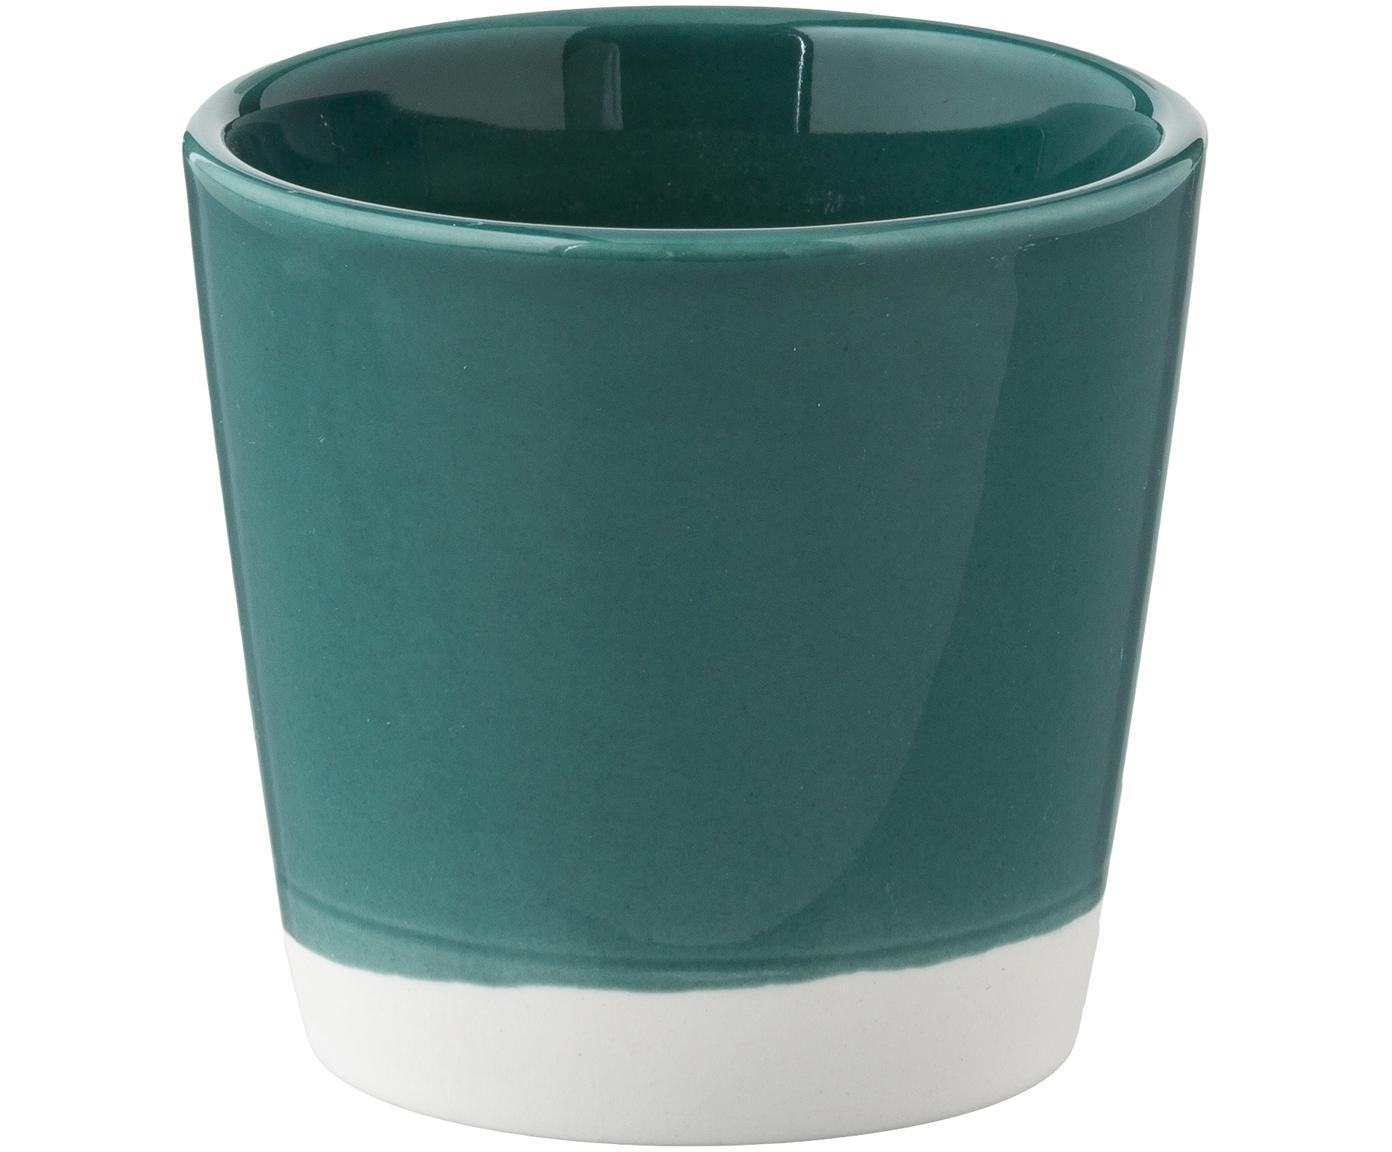 Espressobecher Yen in Gelb/Grün, 4er-Set, Sandstein, Tassen 1 und 2: Weiß, GrünTassen 3 und 4: Weiß, Gelb, Ø 7 x H 6 cm